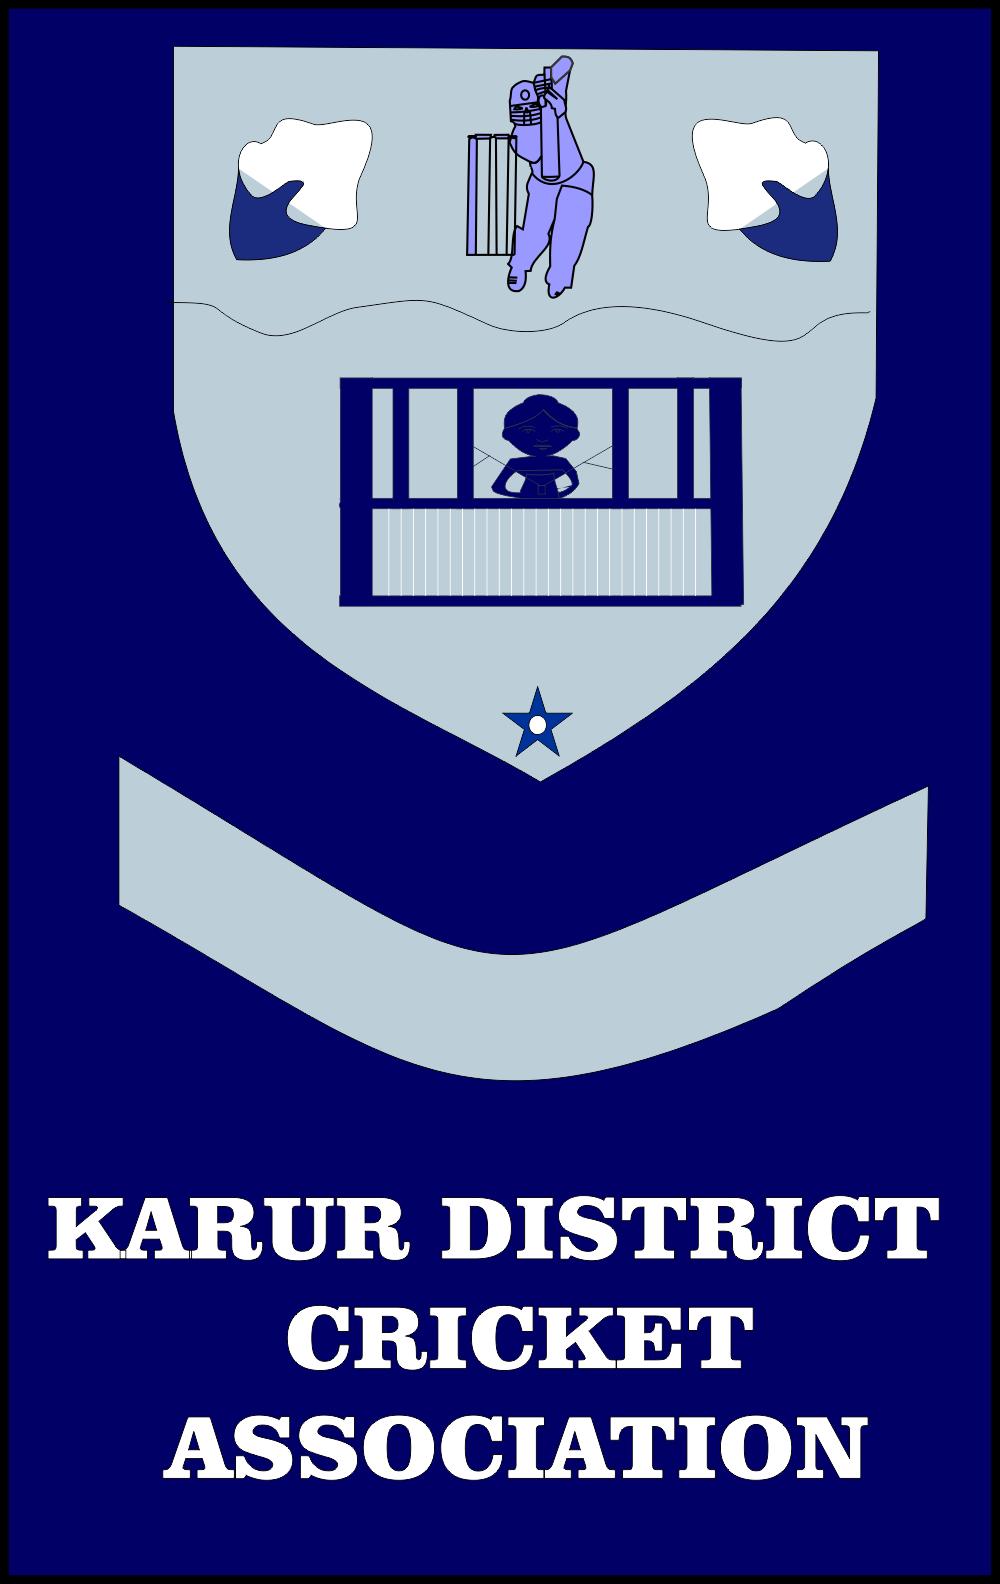 KARUR DISTRICT CRICKET ASSOCIATION